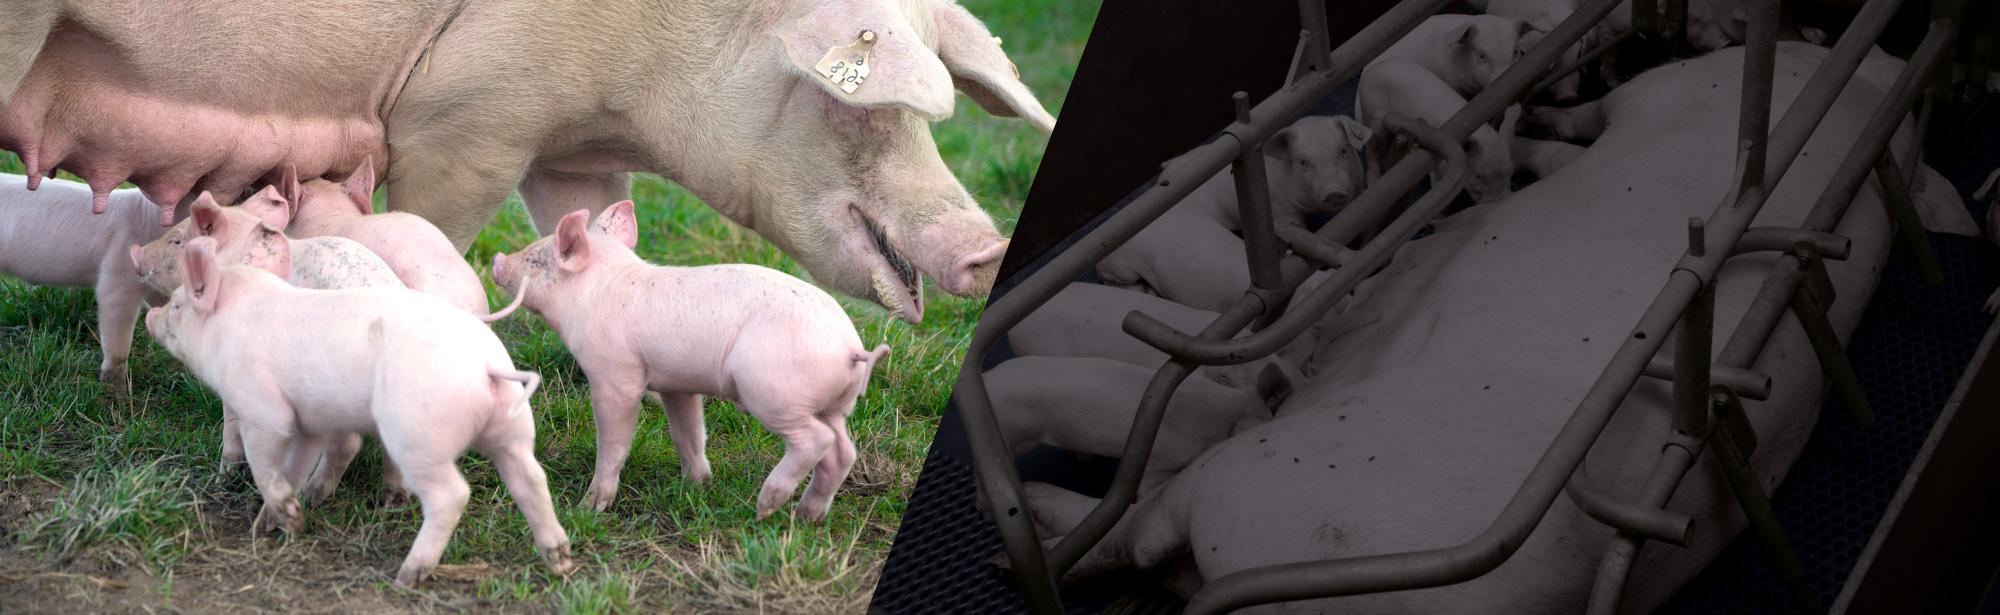 cochons en élevage intensif